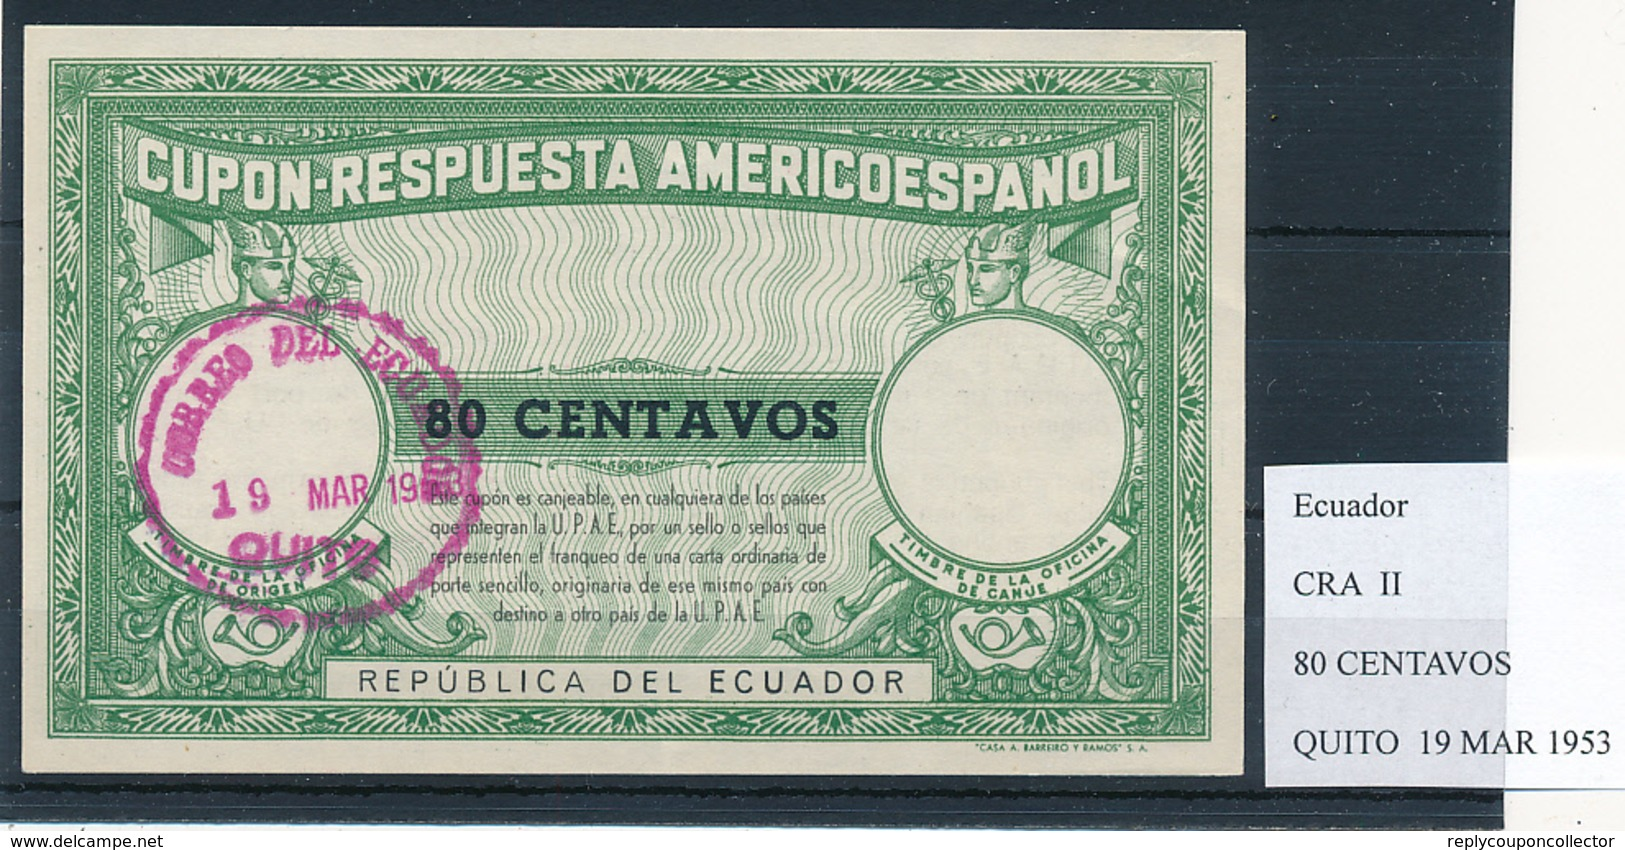 ECUADOR -  Type II  , 80 CENTAVOS  -  COUPON-RESPUESTA AMERICOESPANOL , Reply Coupon Reponse  , UPAE , PUAS - Ecuador